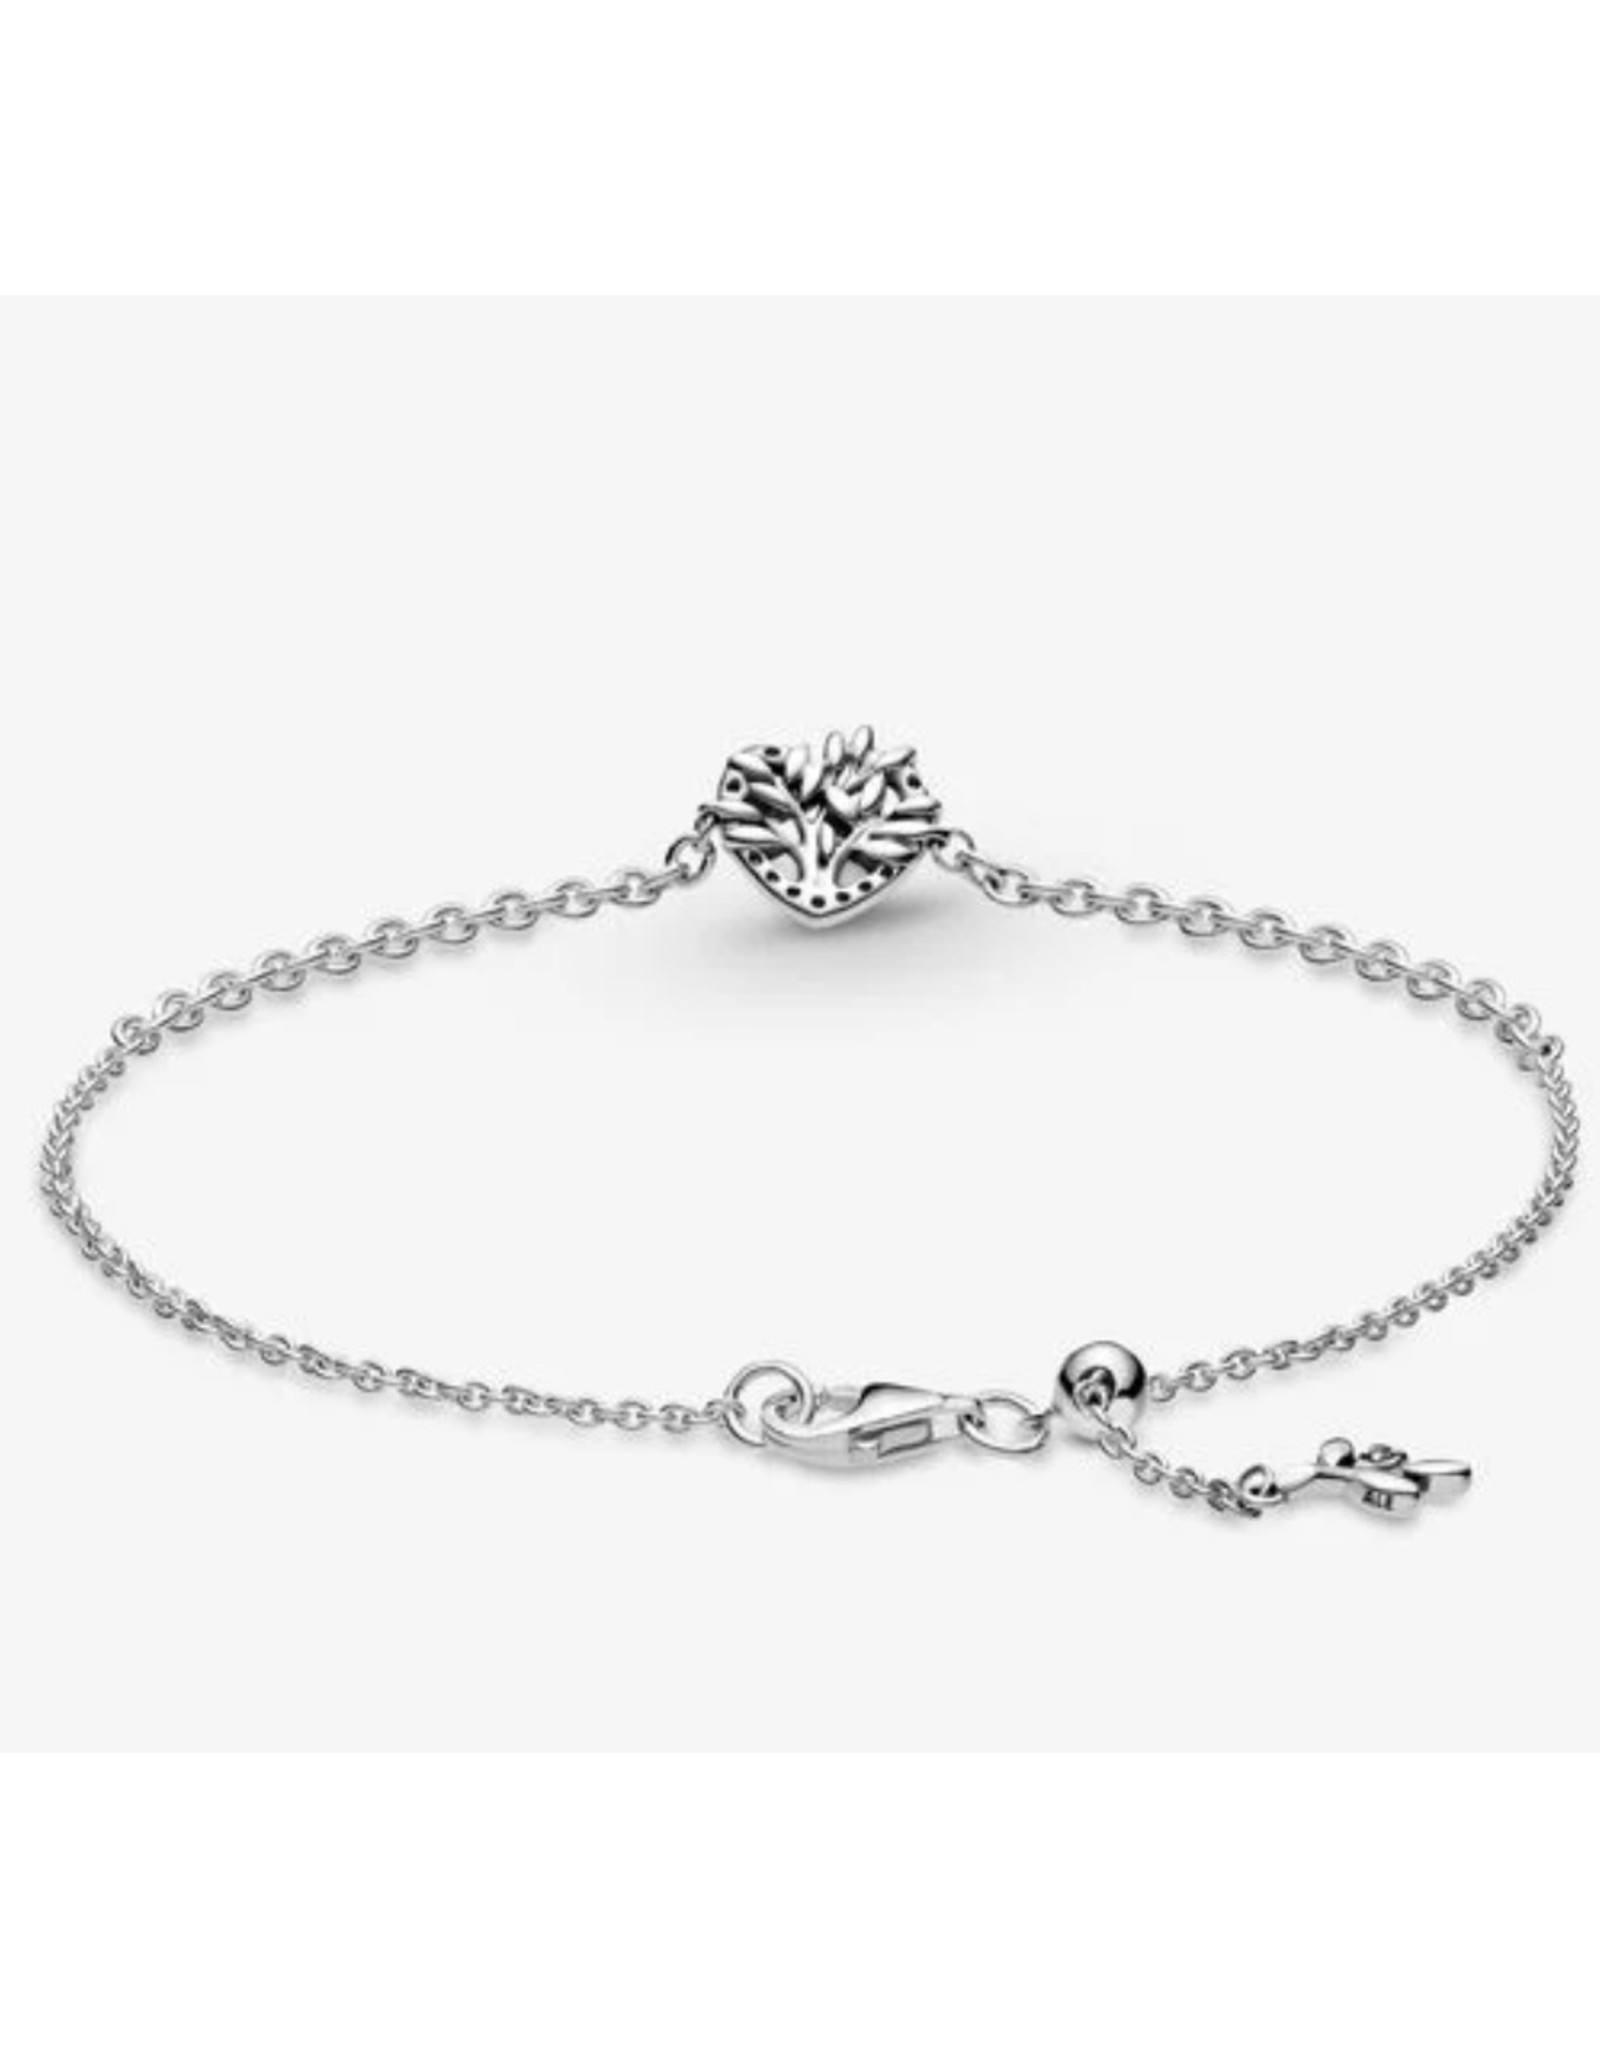 Pandora Pandora Bracelet,599292C01-20, Family Tree Chain Bracelet, Clear CZ